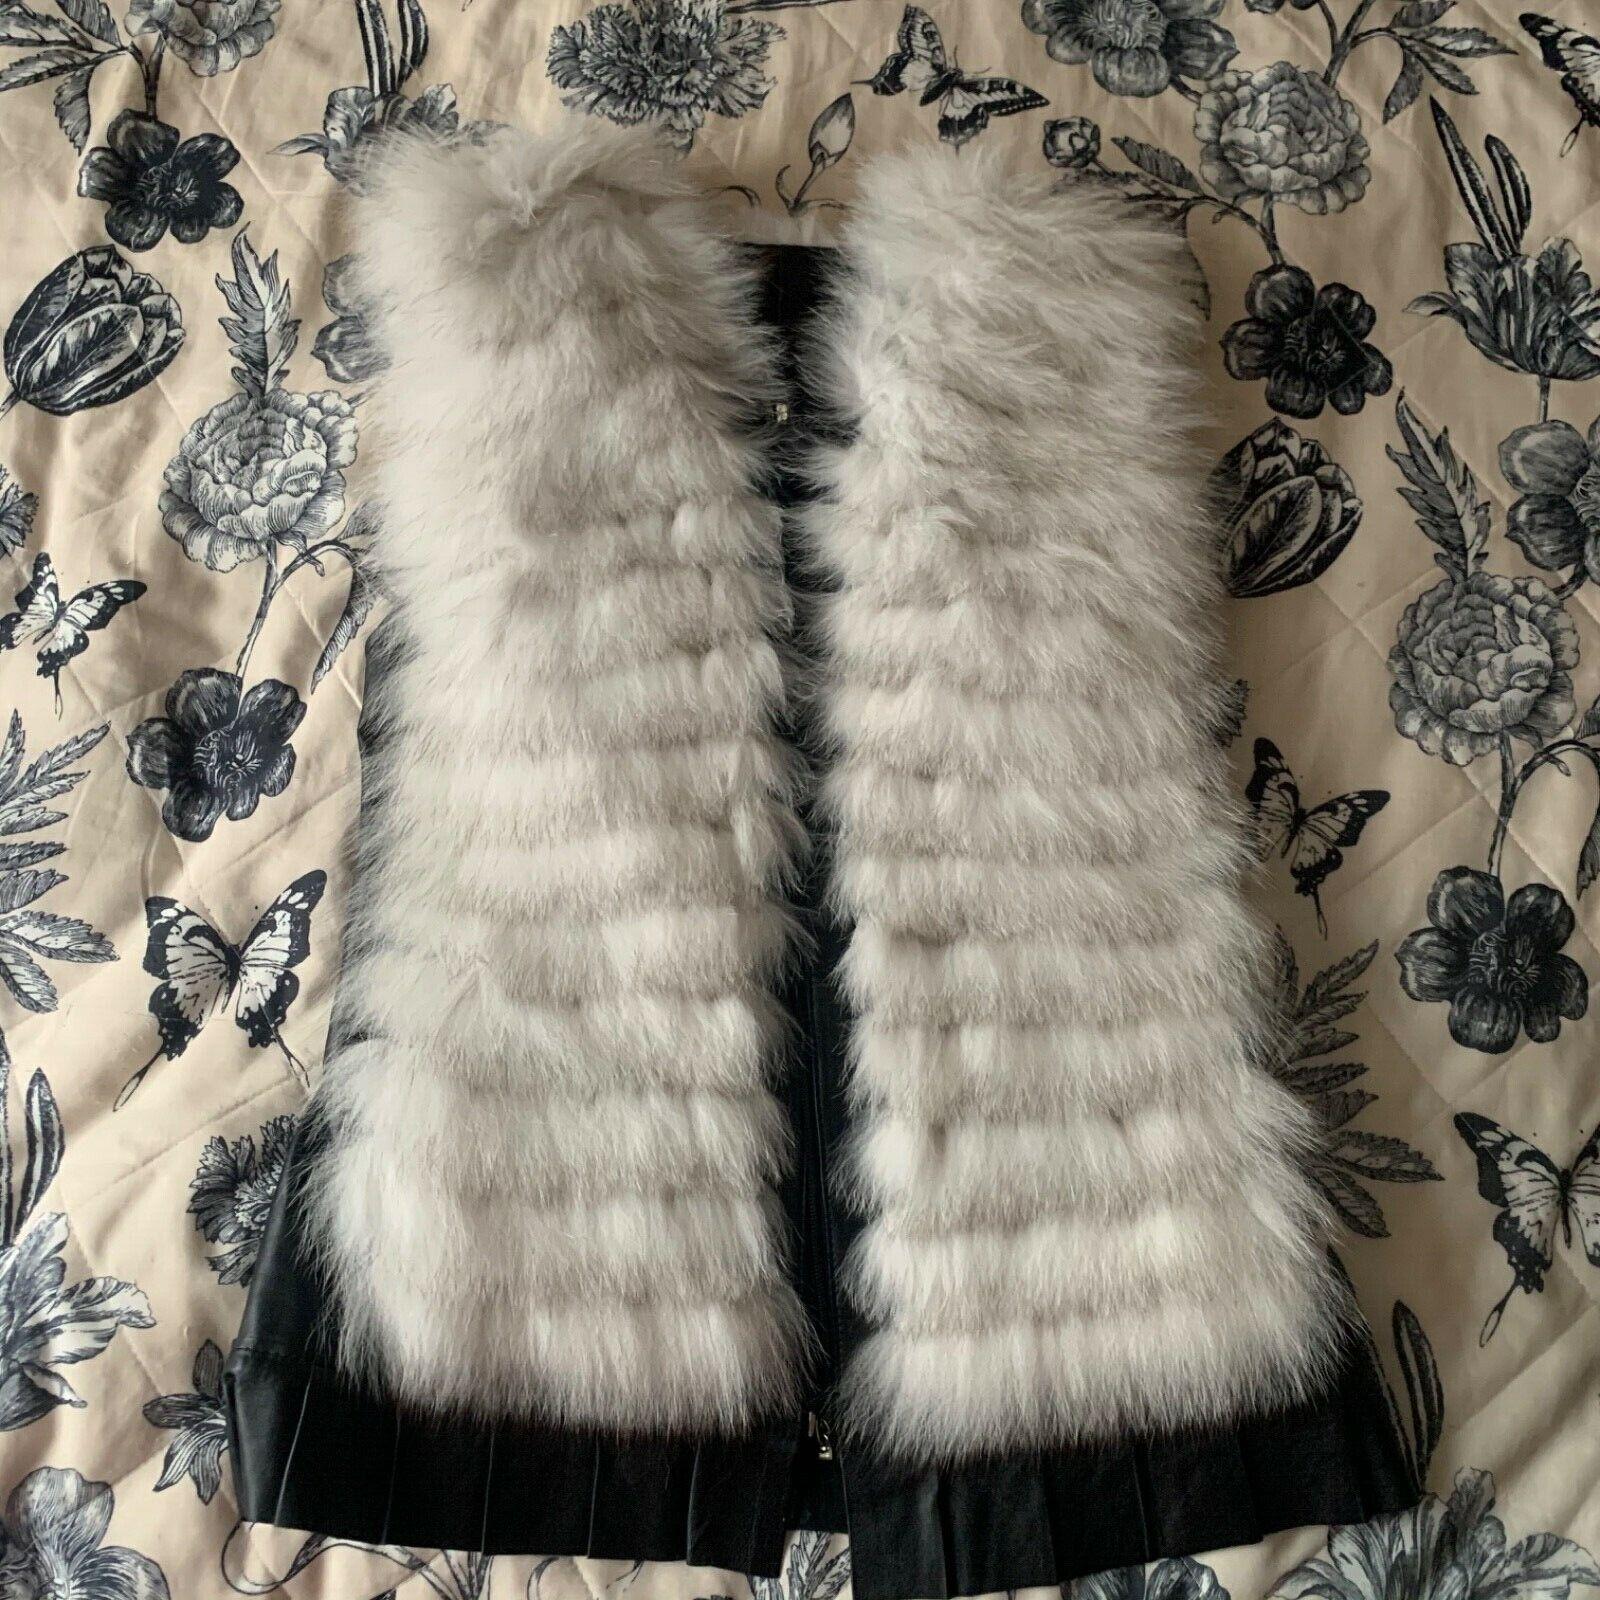 Beautiful Fox Fur Gilet, Waistcoat, Jacket.Size S. Nice Christmas gift